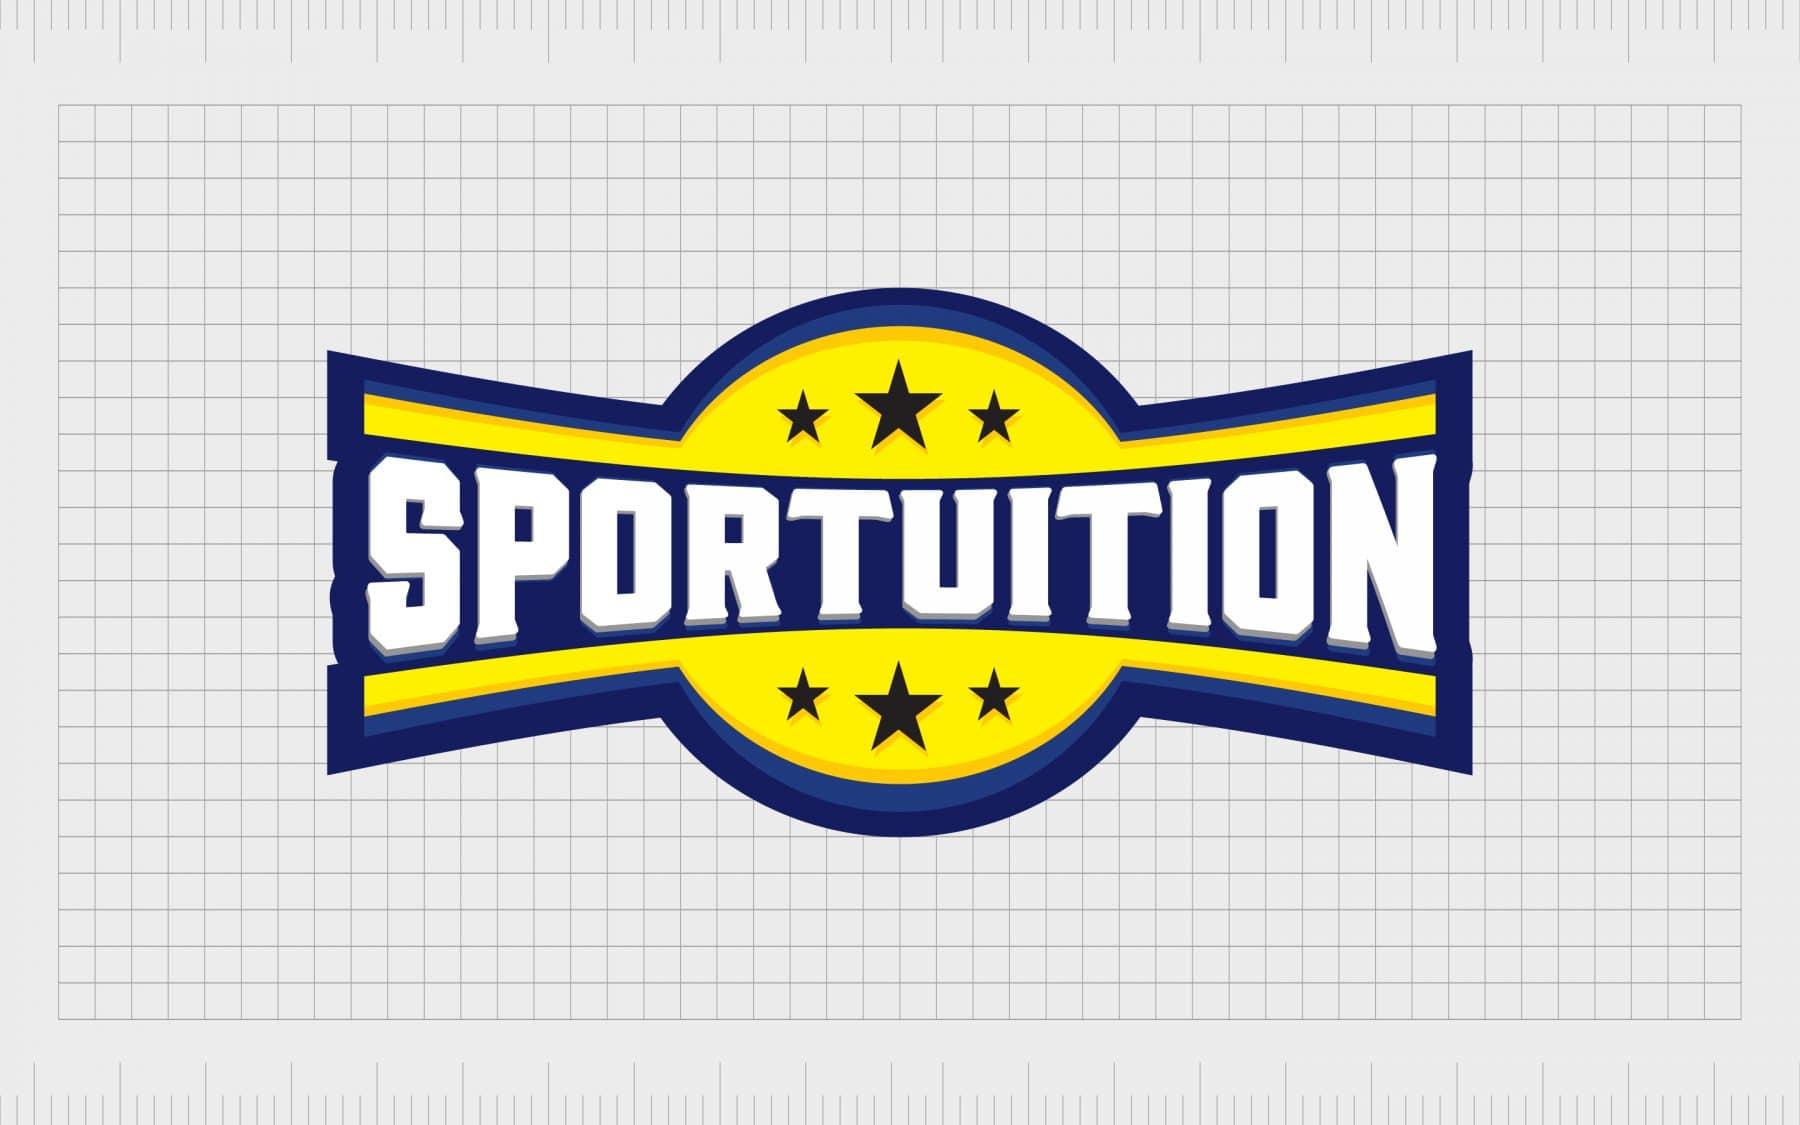 Sportuition